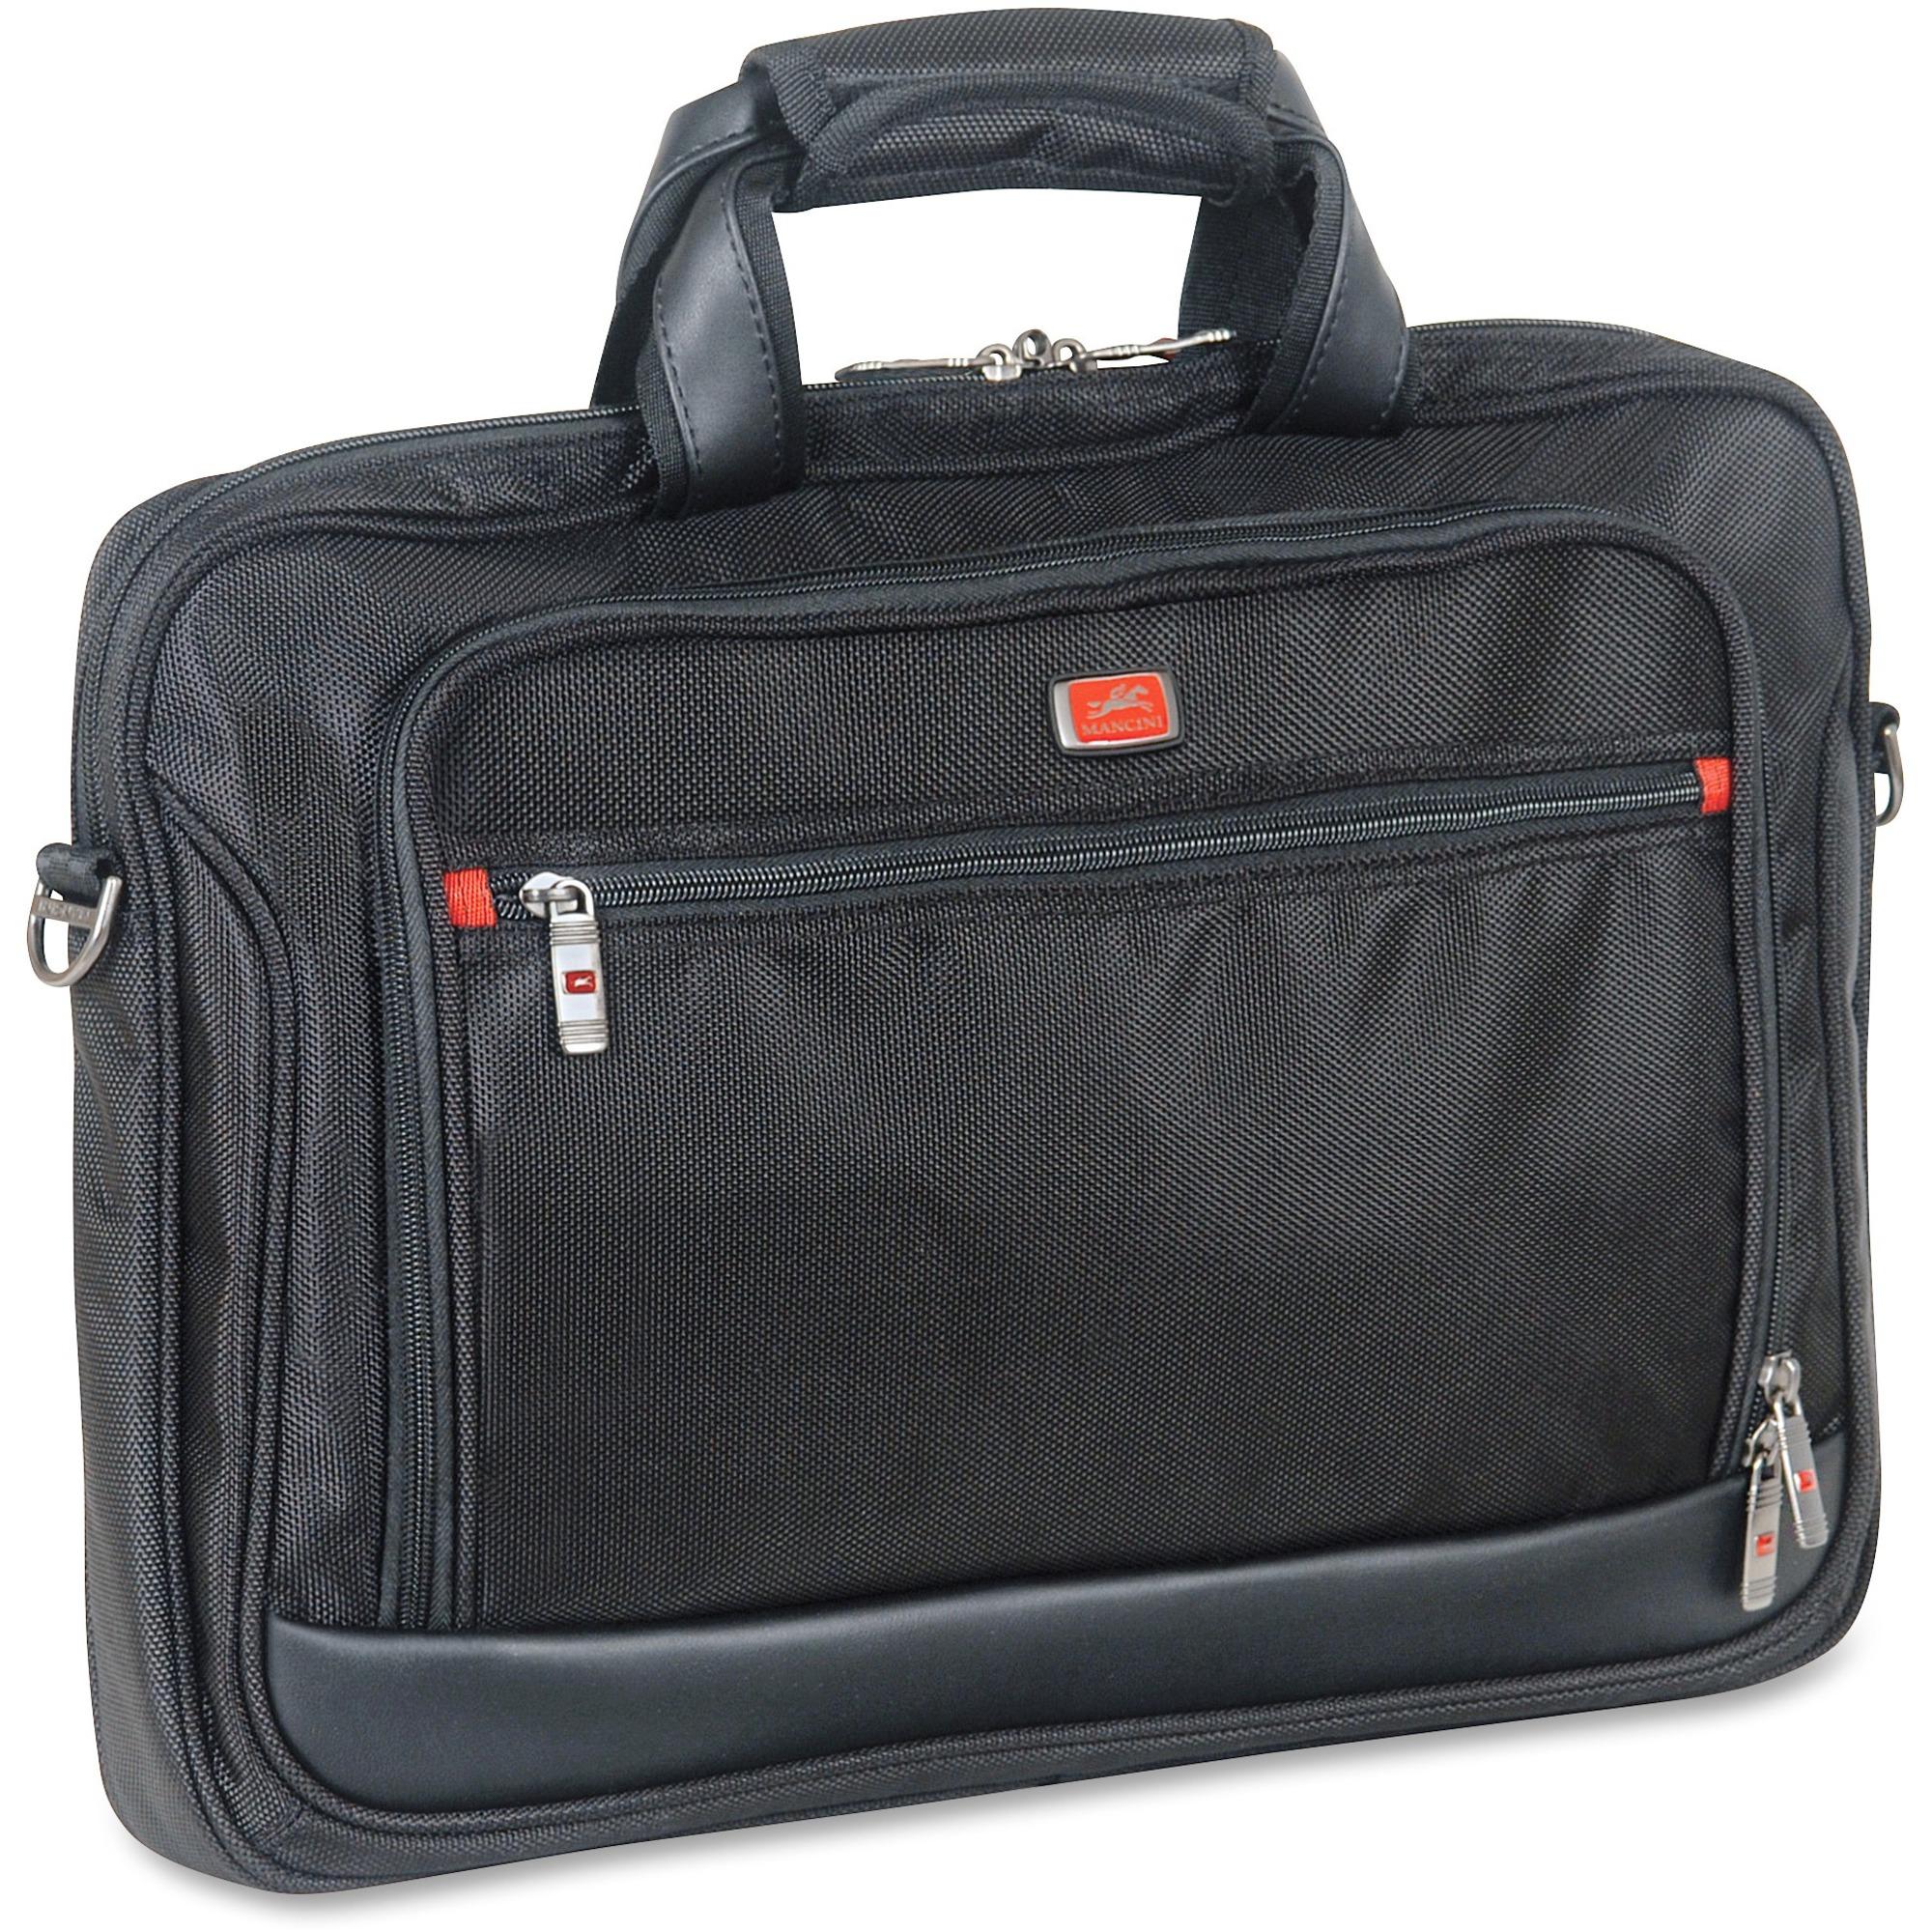 7bd995a1a Merritt Printing    Office Supplies    Business Travel Bags ...